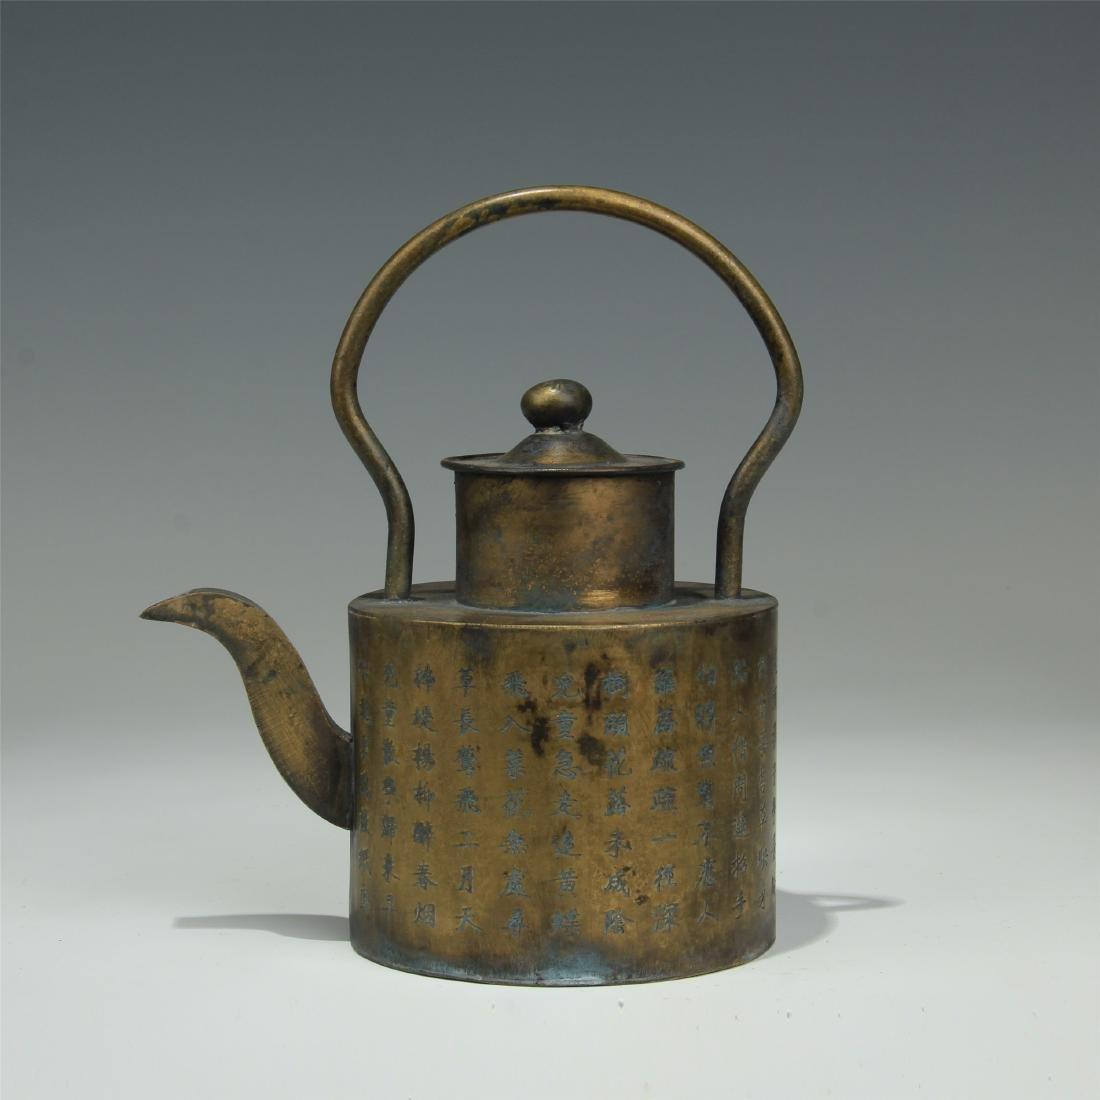 CHINESE COPPER TEA POT